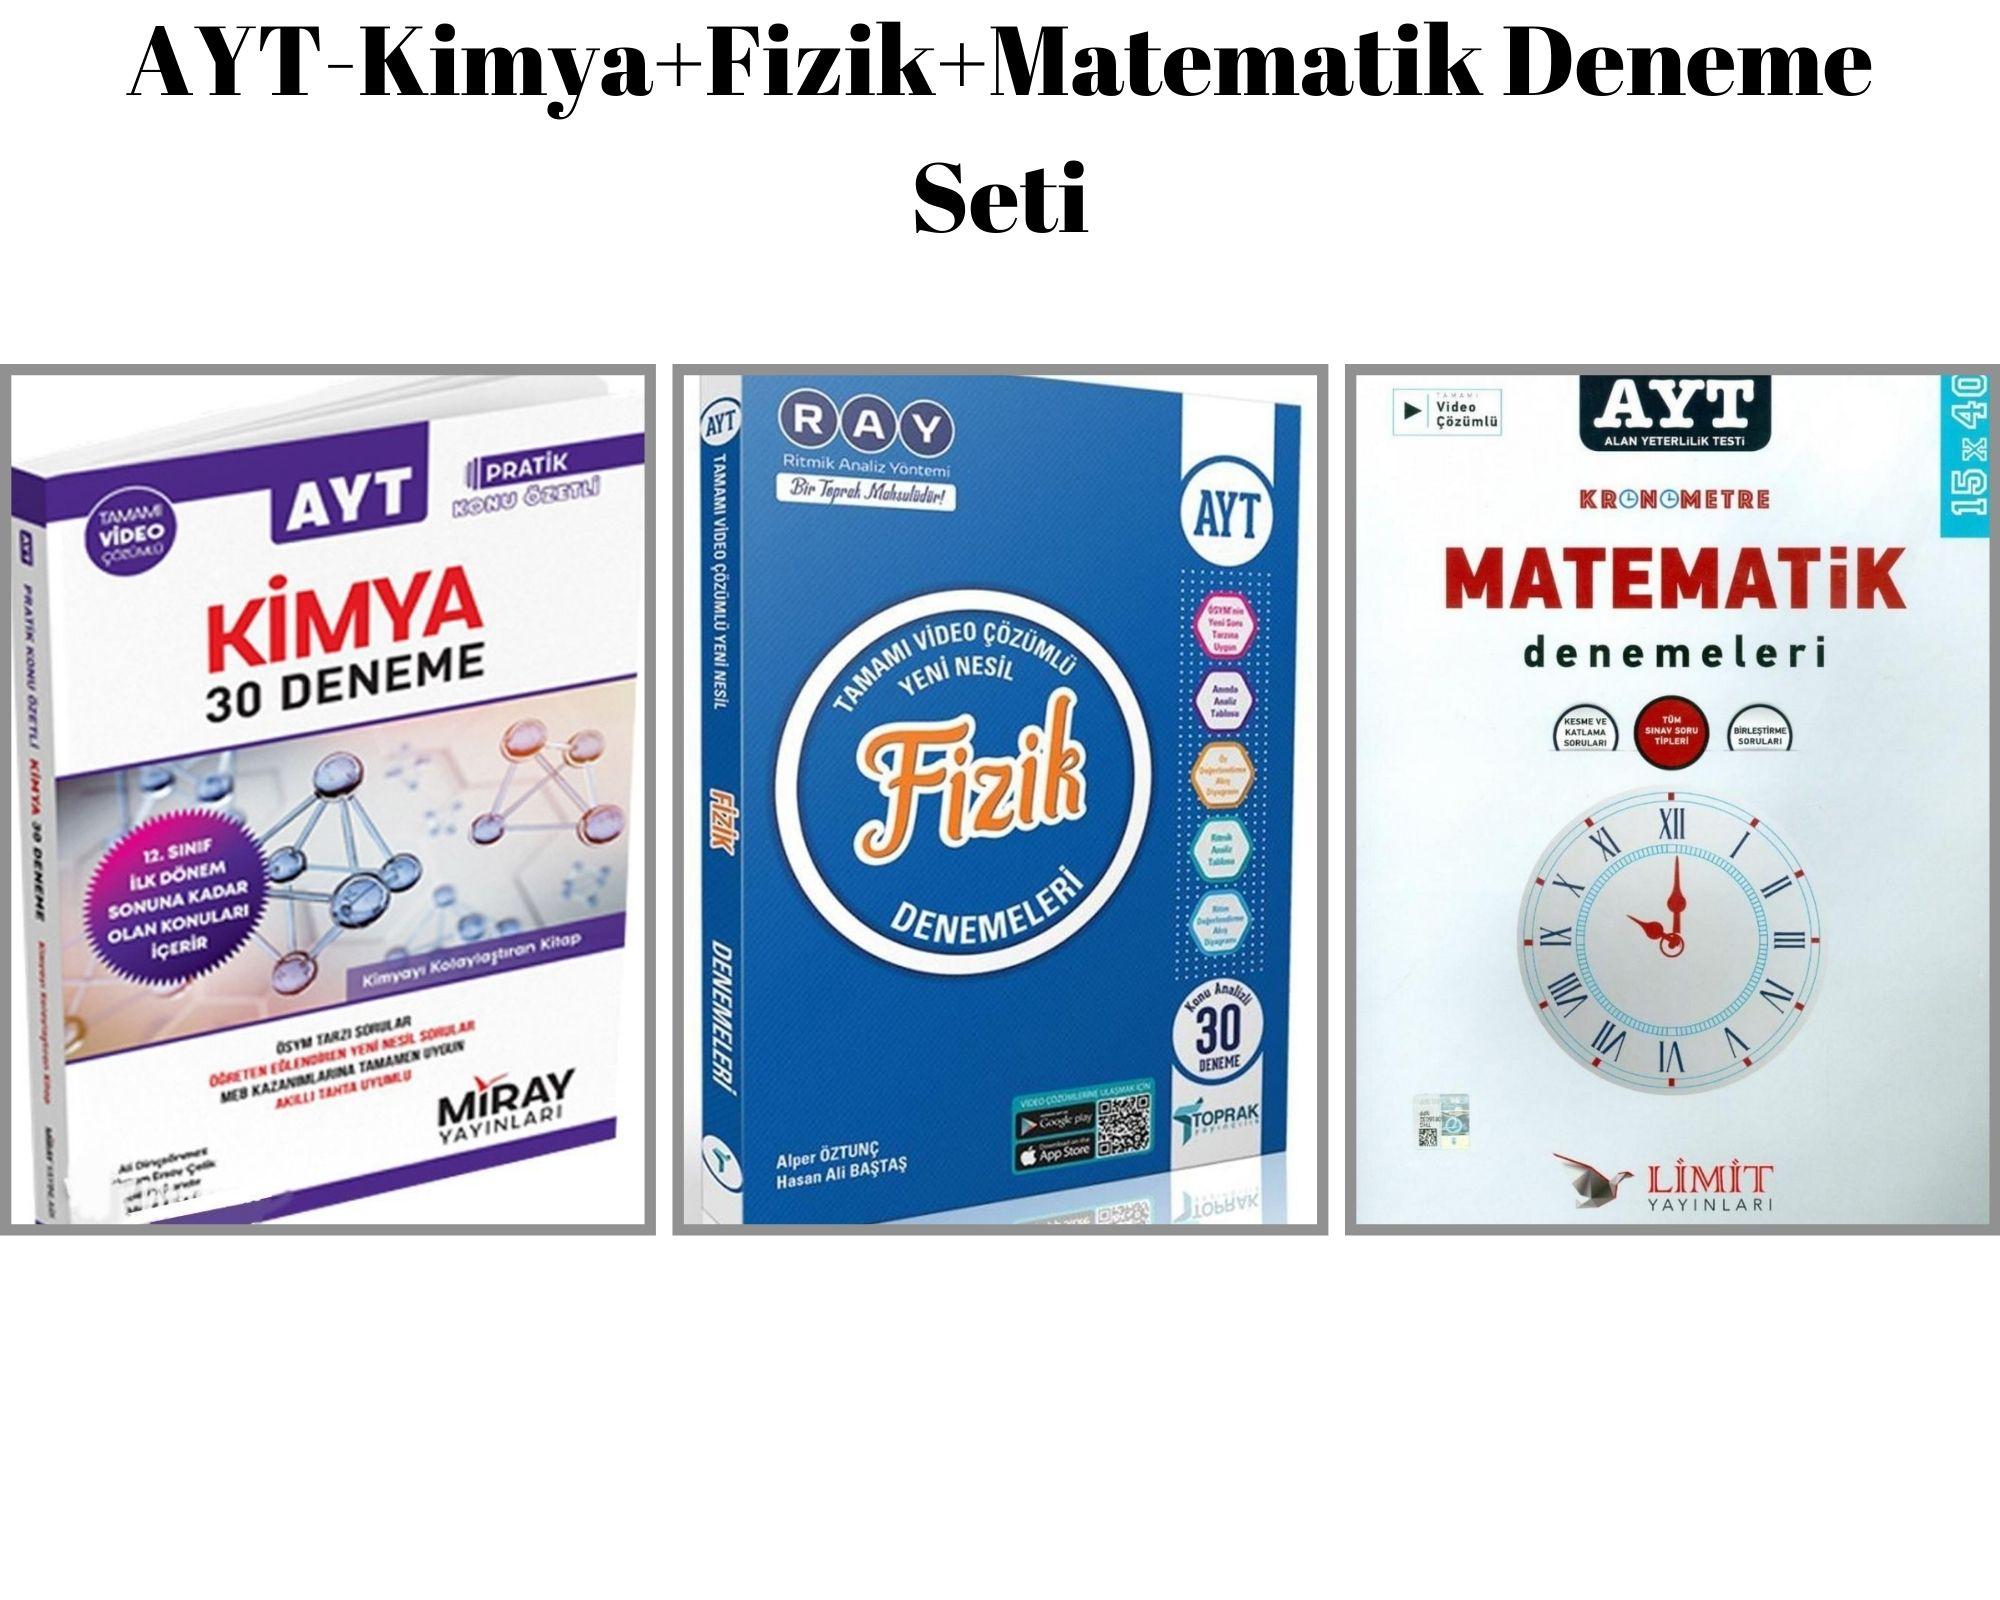 AYT-Kimya+Fizik+Matematik Deneme Seti